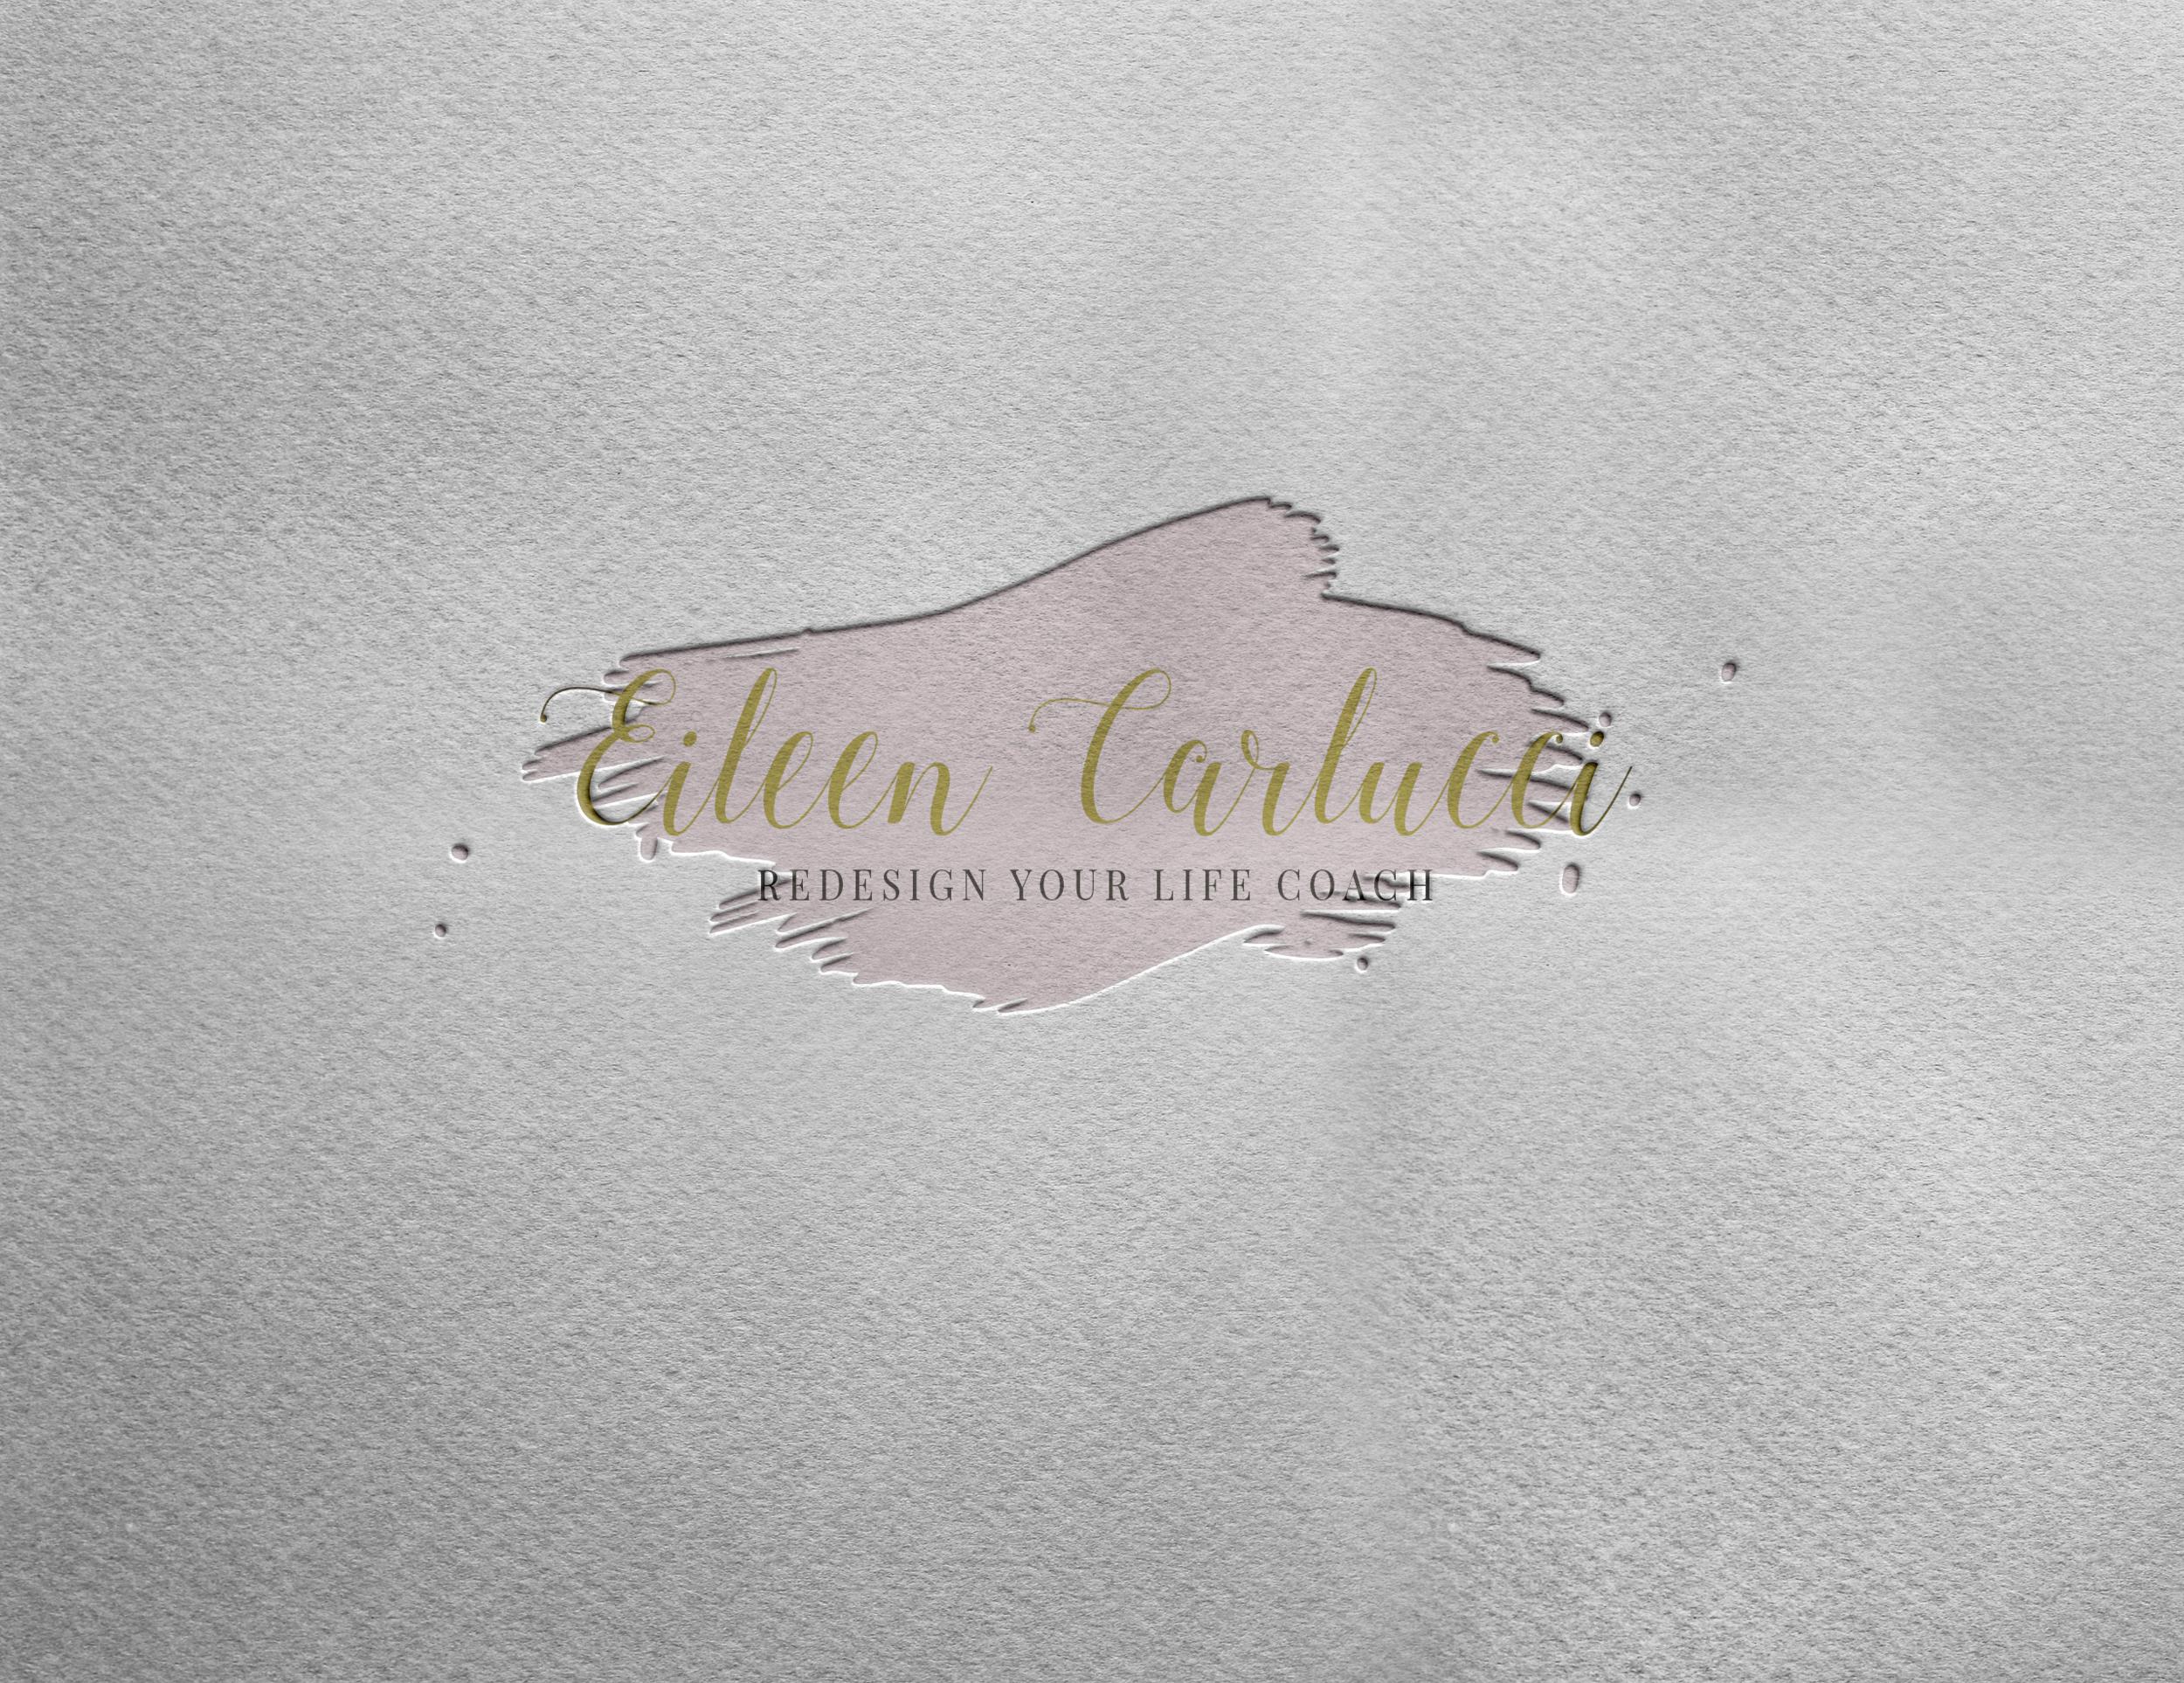 Logo Portfolio - Eileen Carlucci.png